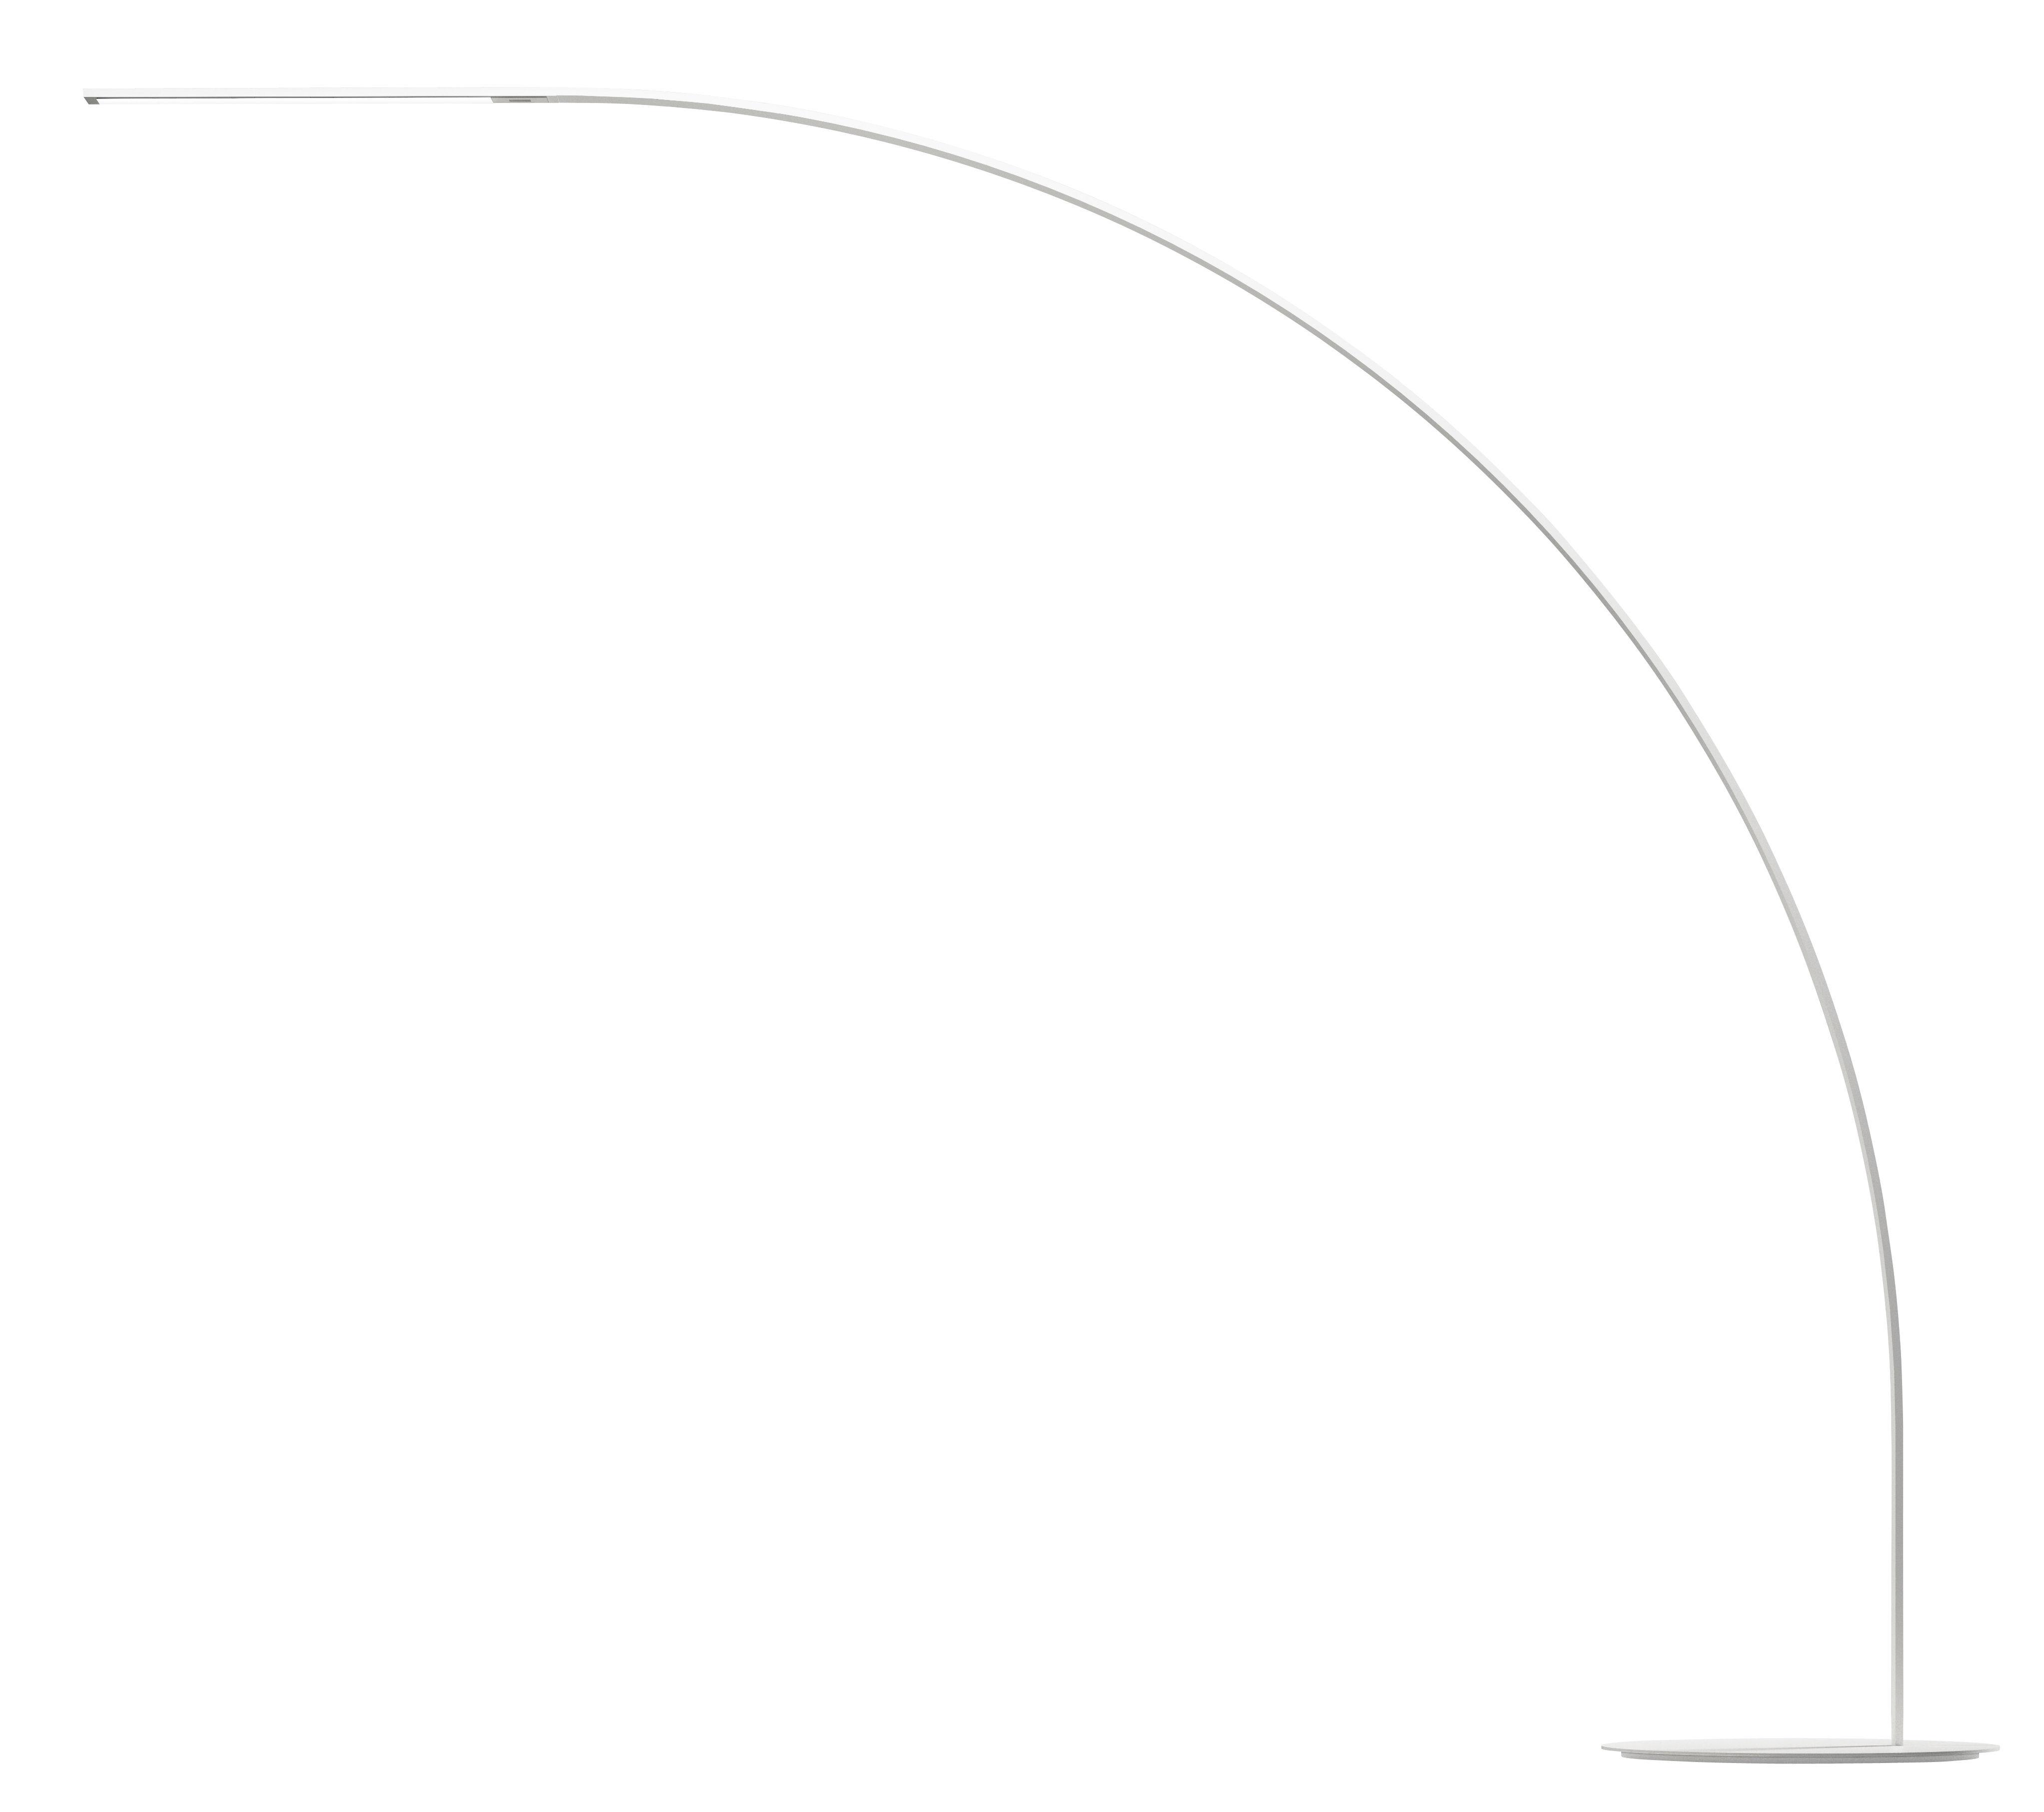 Luminaire - Lampadaires - Lampadaire Yumi LED / H 210 cm - Fontana Arte - Blanc - Aluminium, Matériau composite, Métal laqué